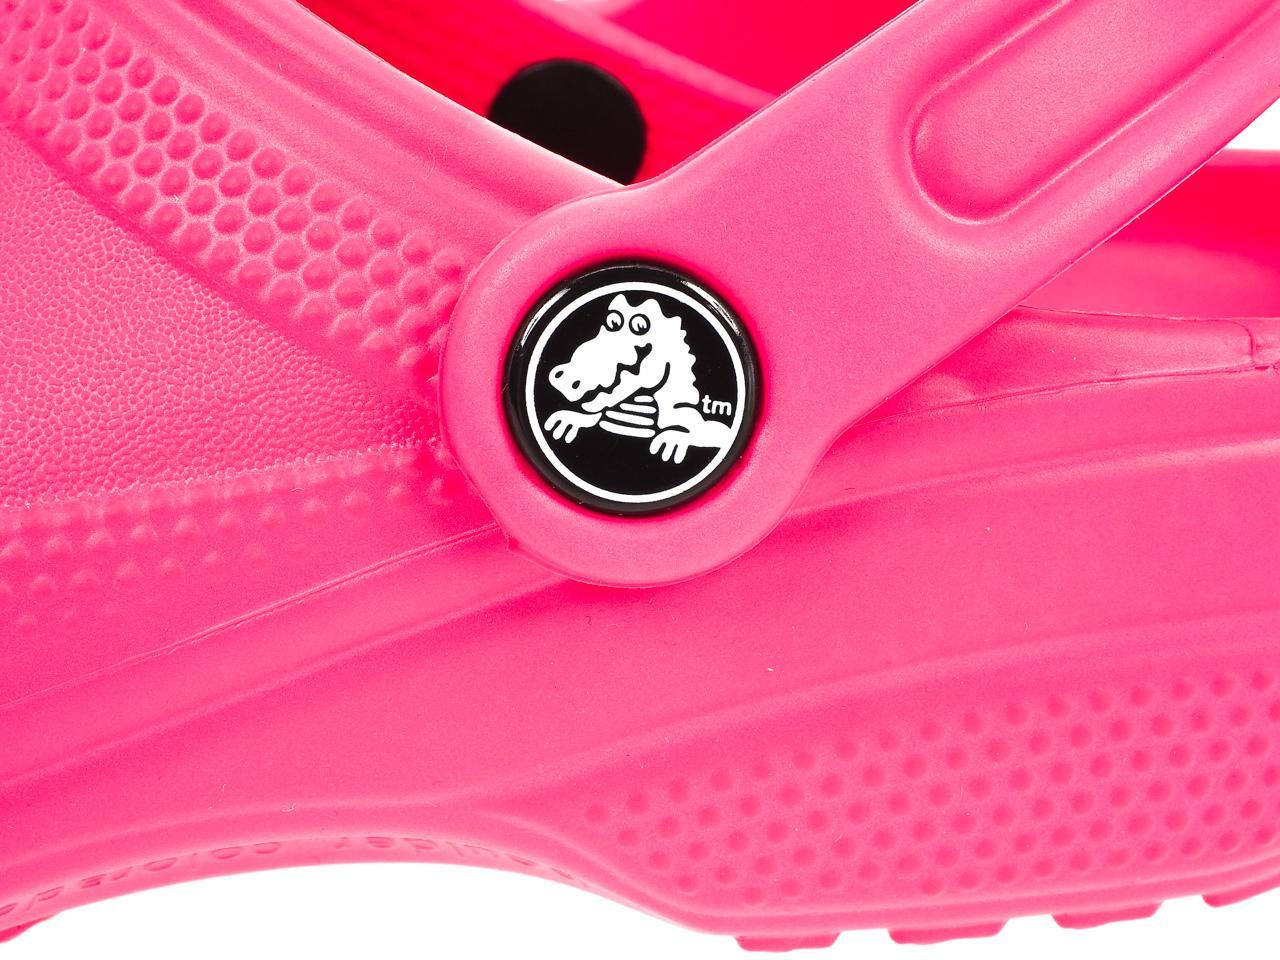 Sabots-Crocs-Classic-candy-pink-kid-Rose-77832-Neuf miniature 3